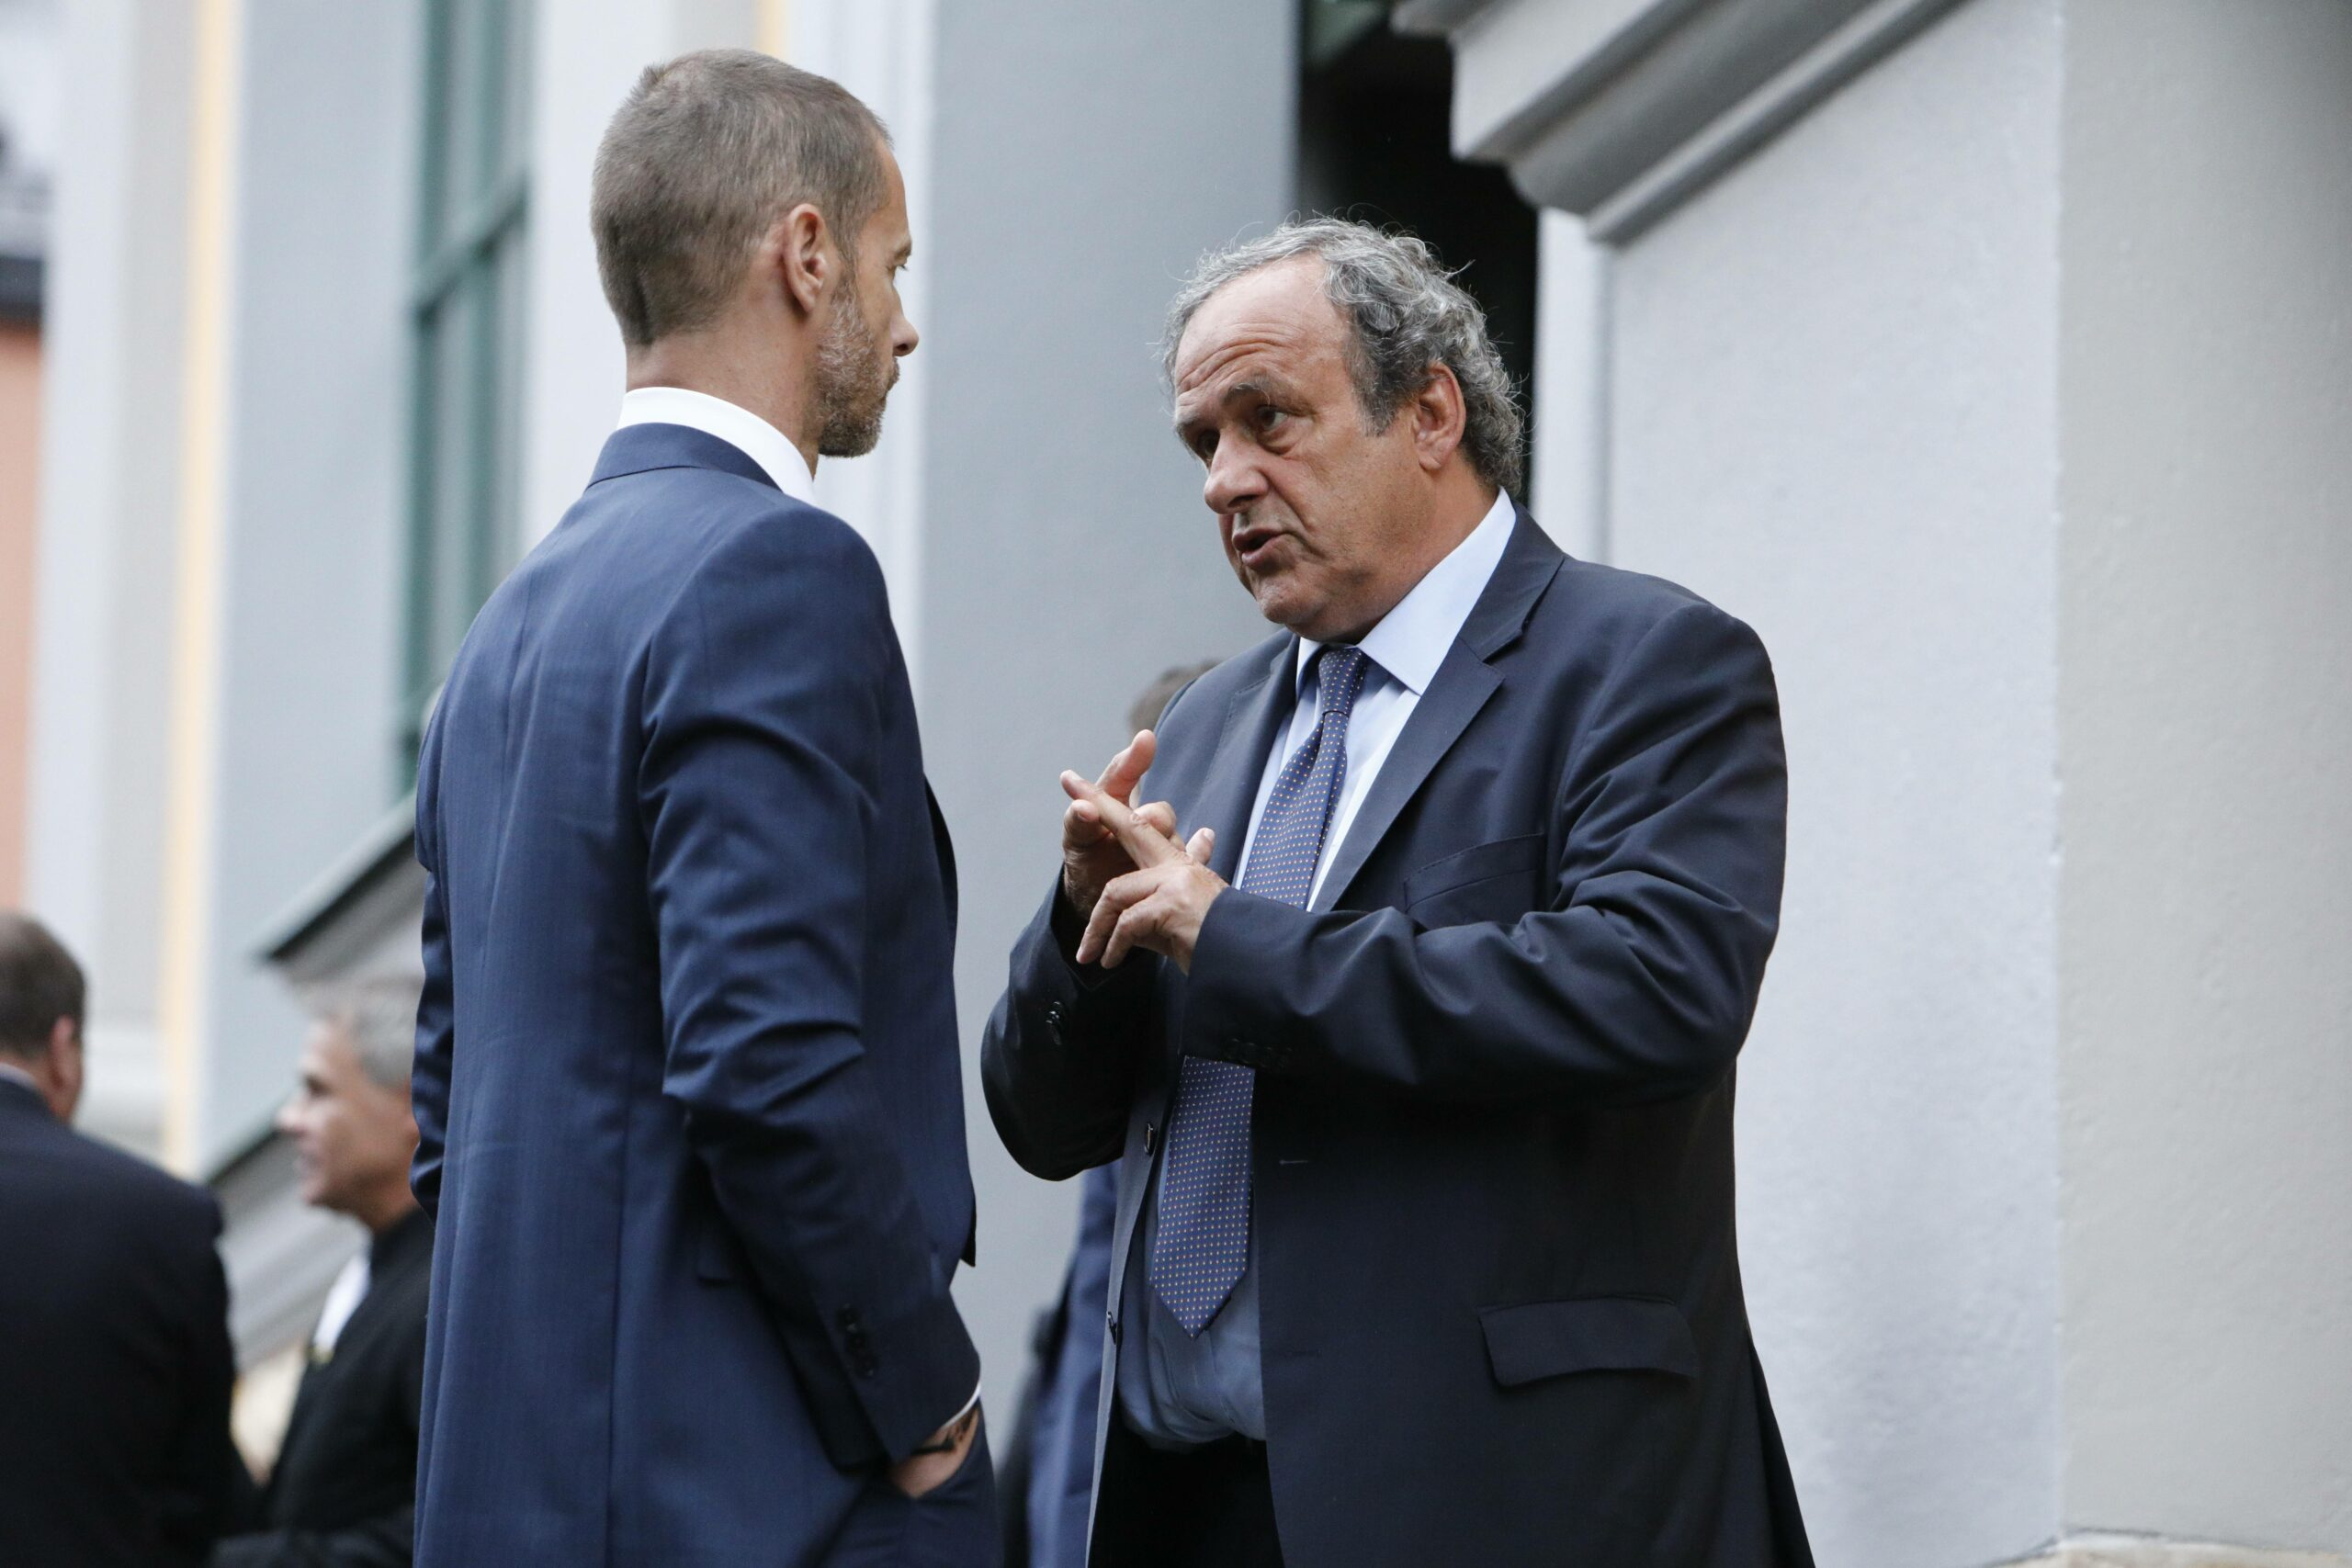 Ceferin & Platini (UEFA) im Gespräch